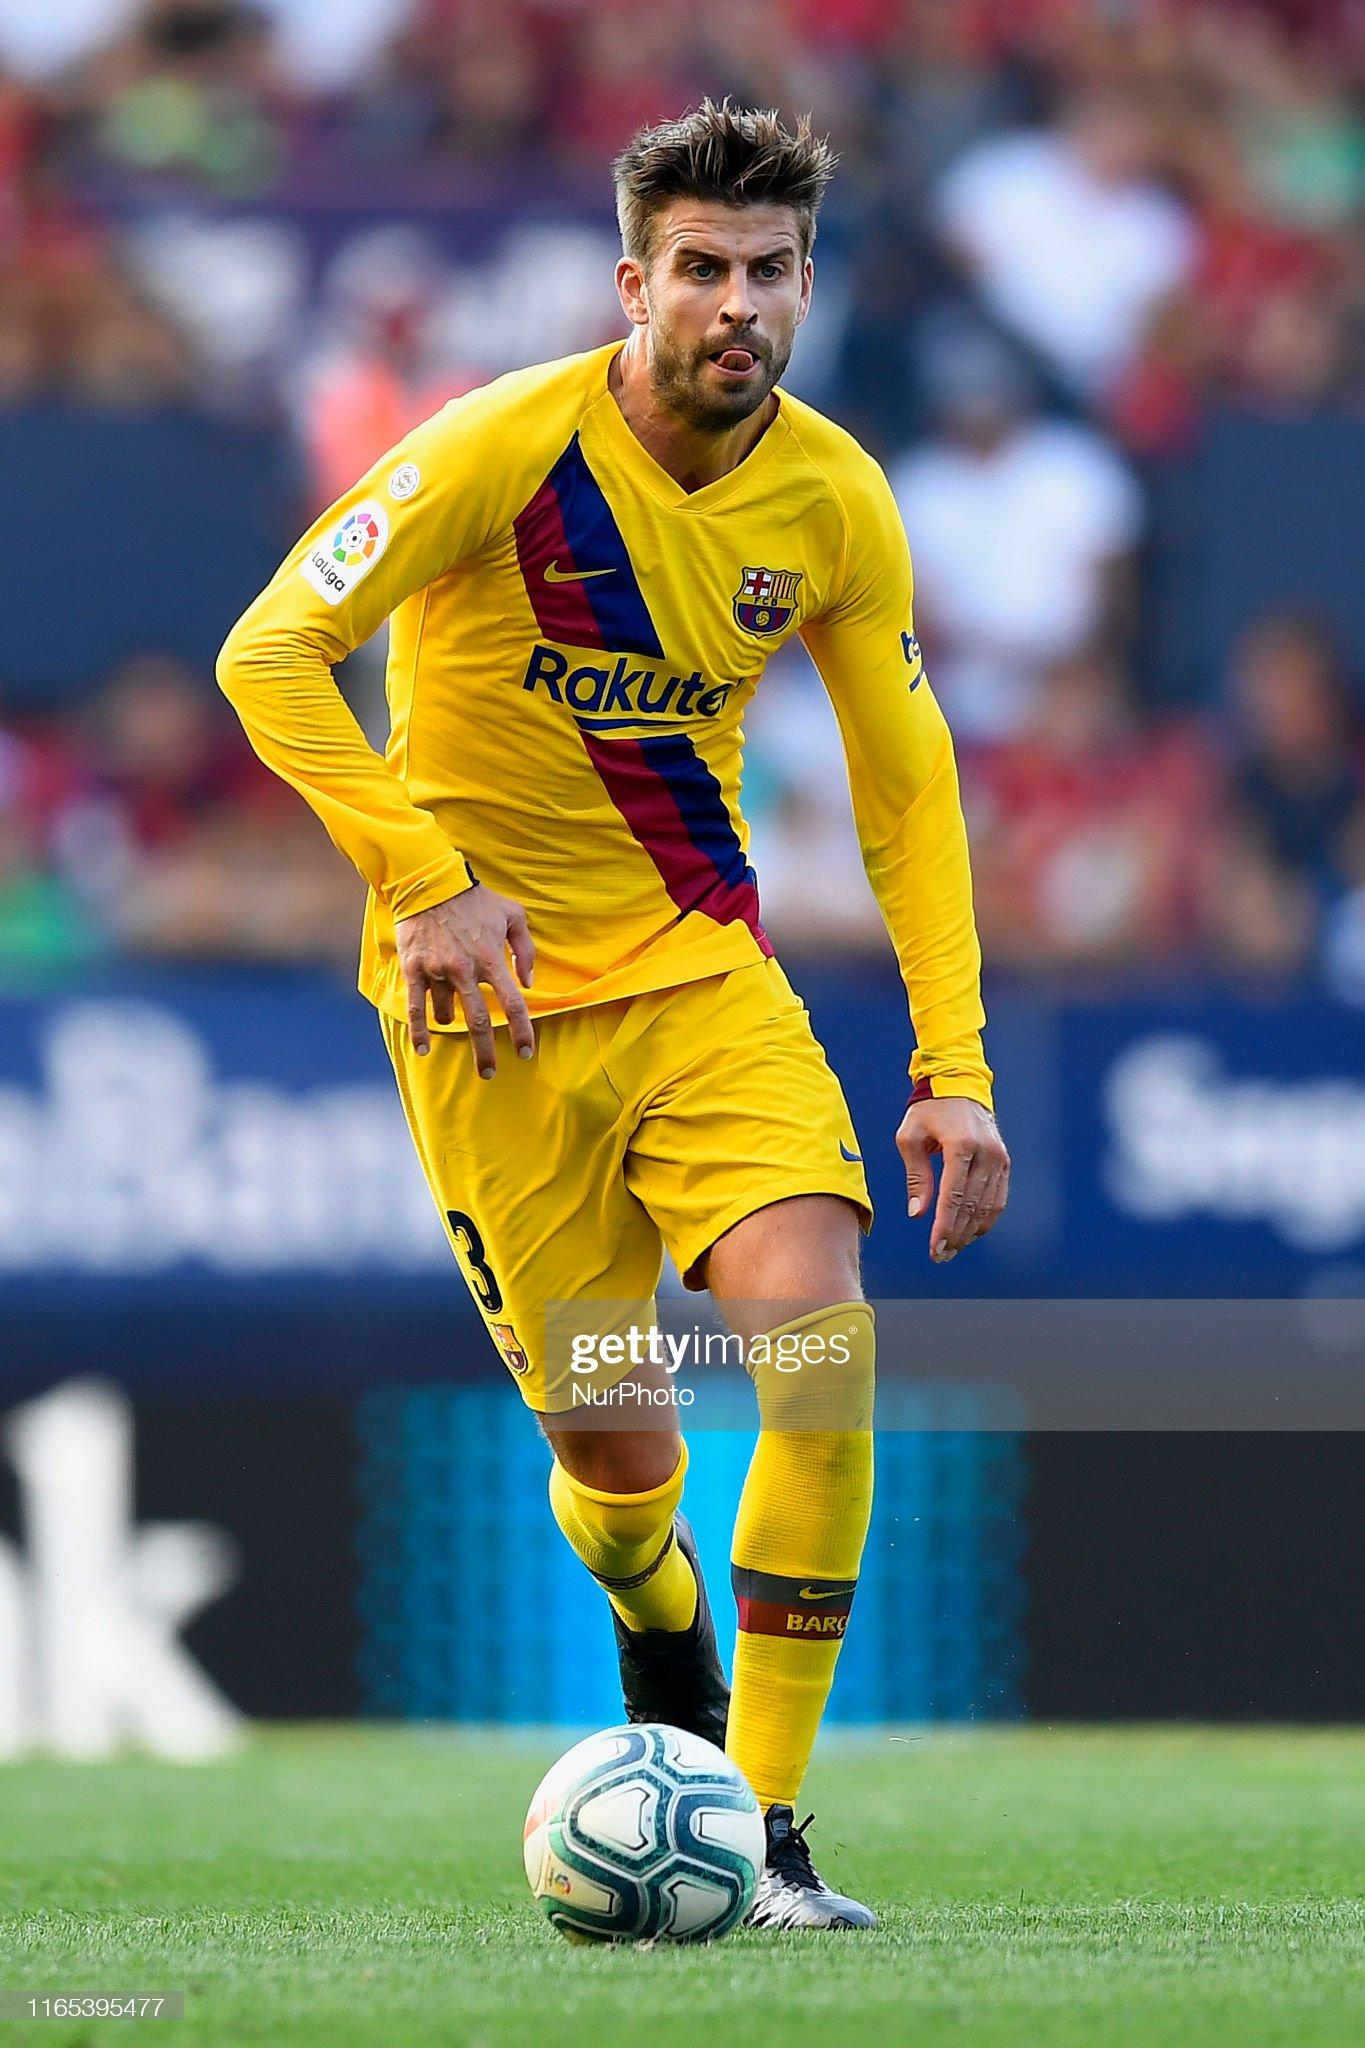 صور مباراة : أوساسونا - برشلونة 2-2 ( 31-08-2019 )  Gerard-pique-of-barcelona-controls-the-ball-during-the-liga-match-ca-picture-id1165395477?s=2048x2048